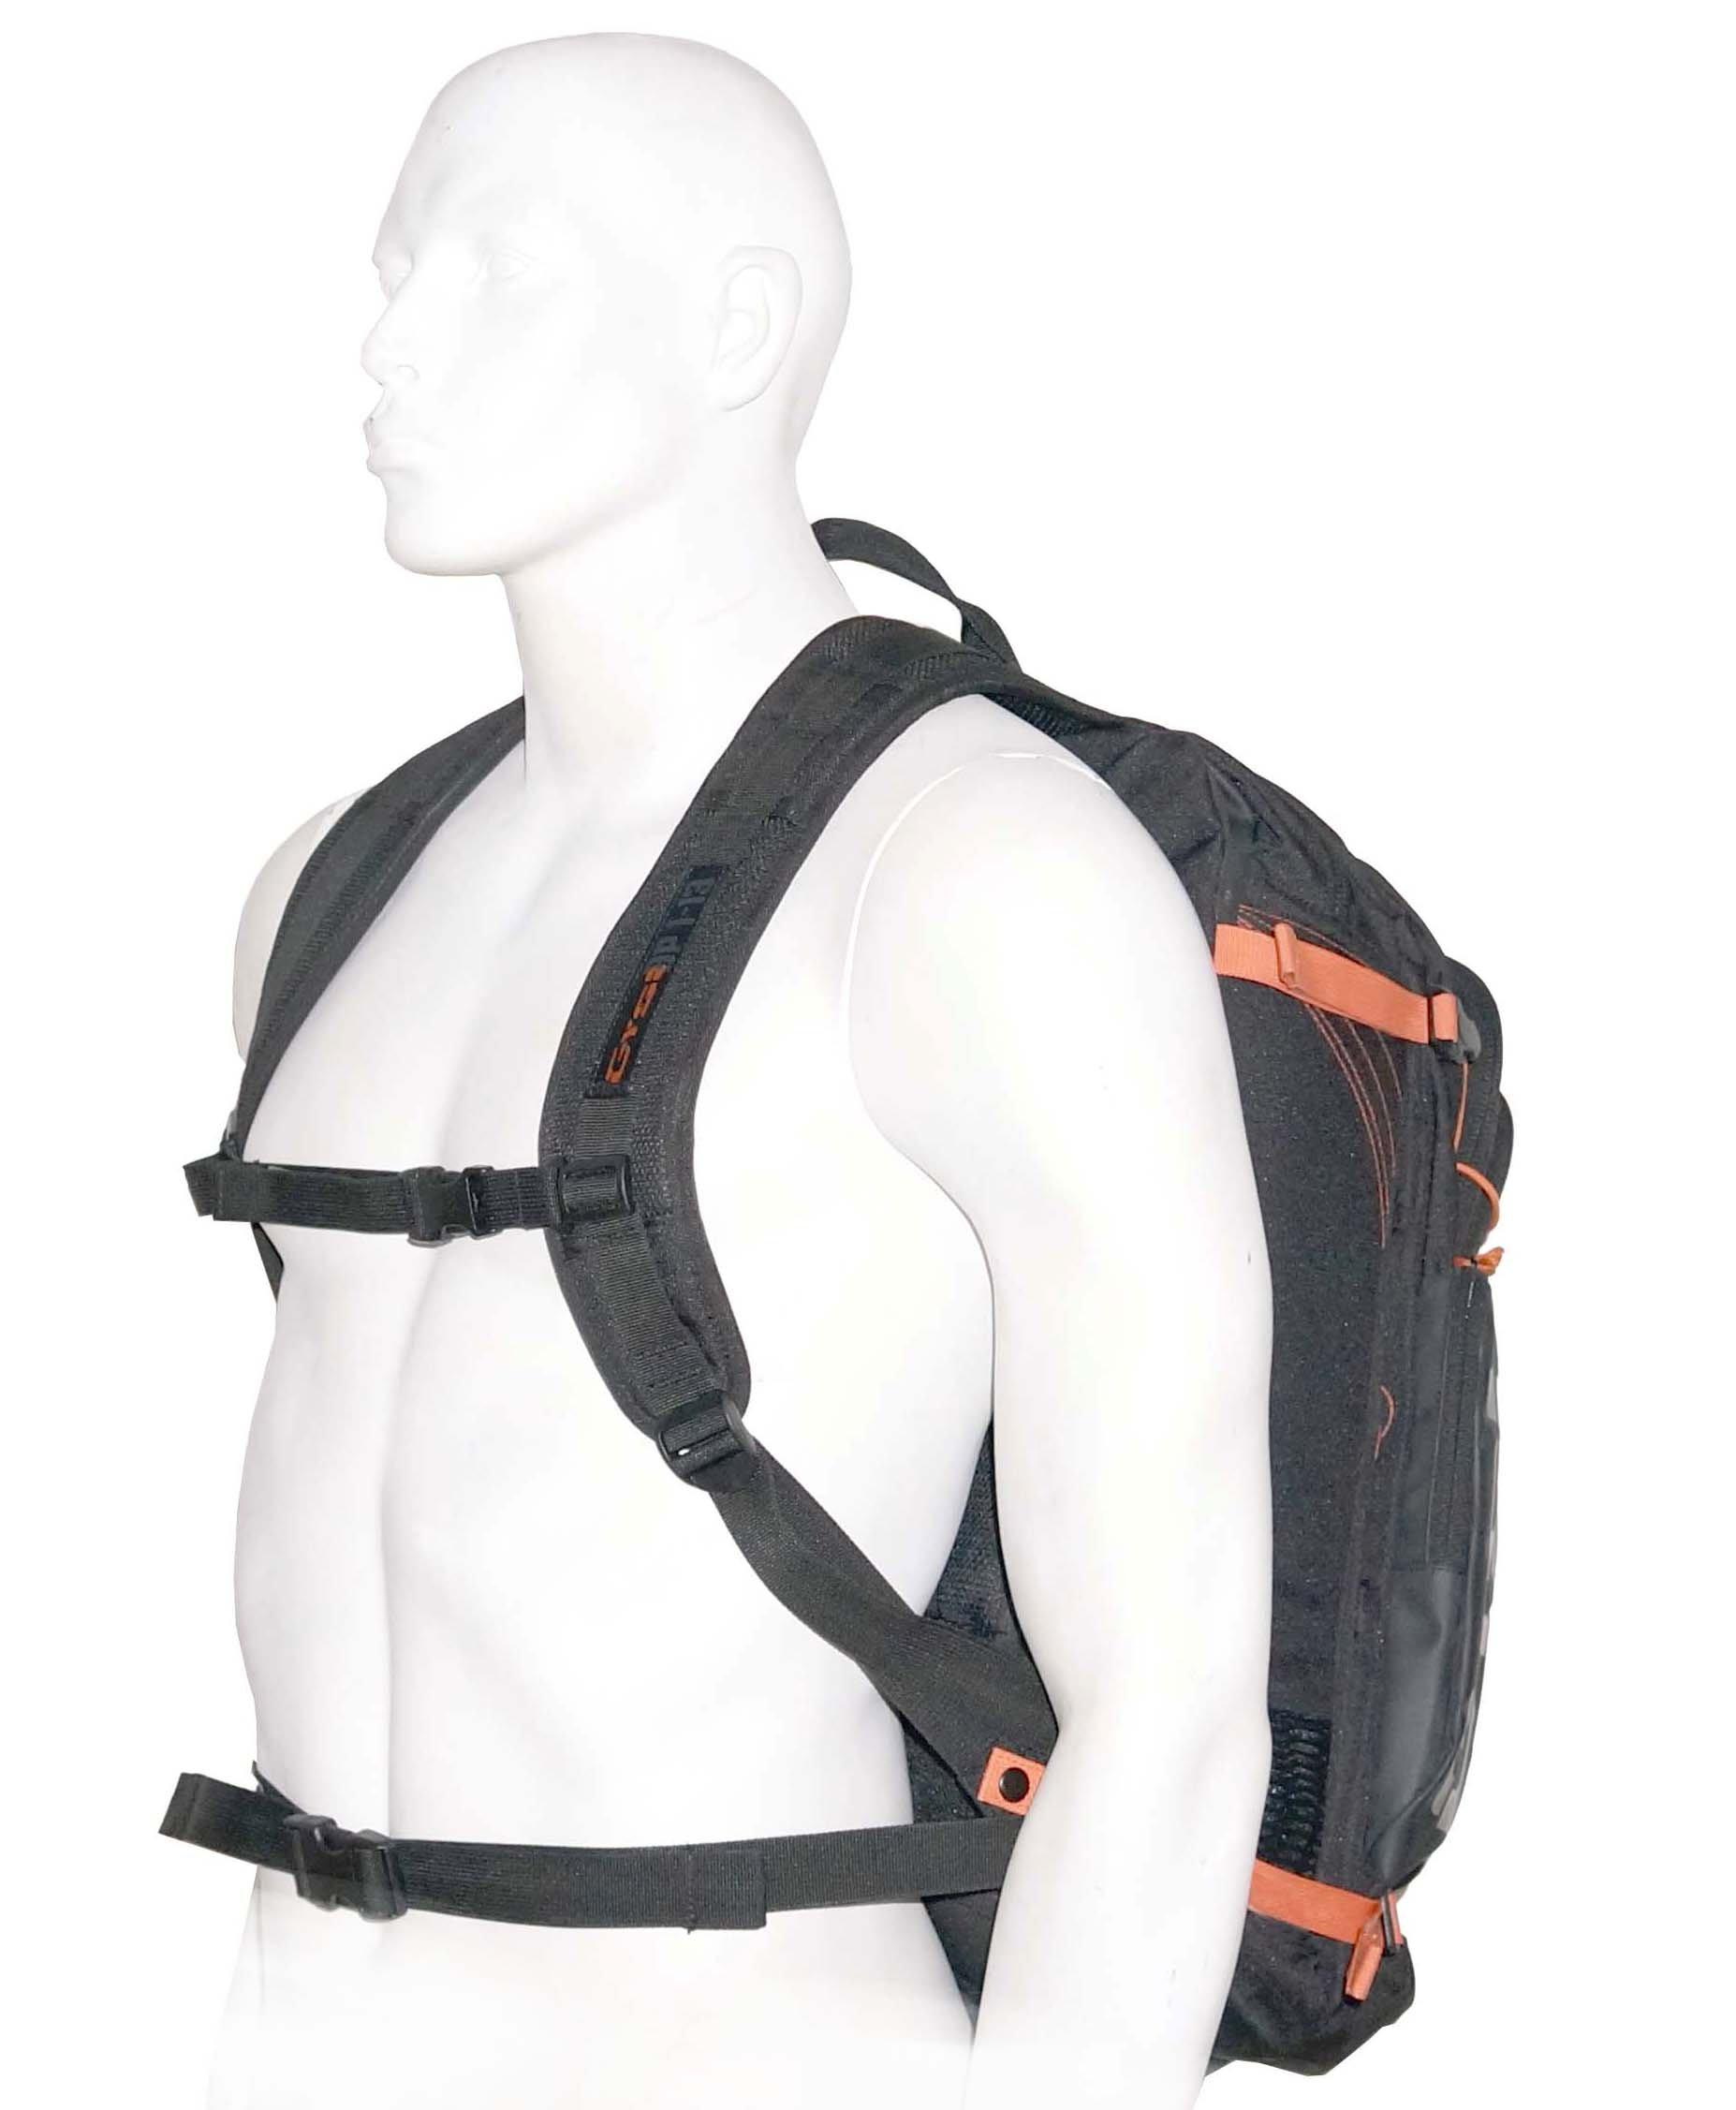 Gyst Concept Transition Bag Backpack by GYST (Image #1)